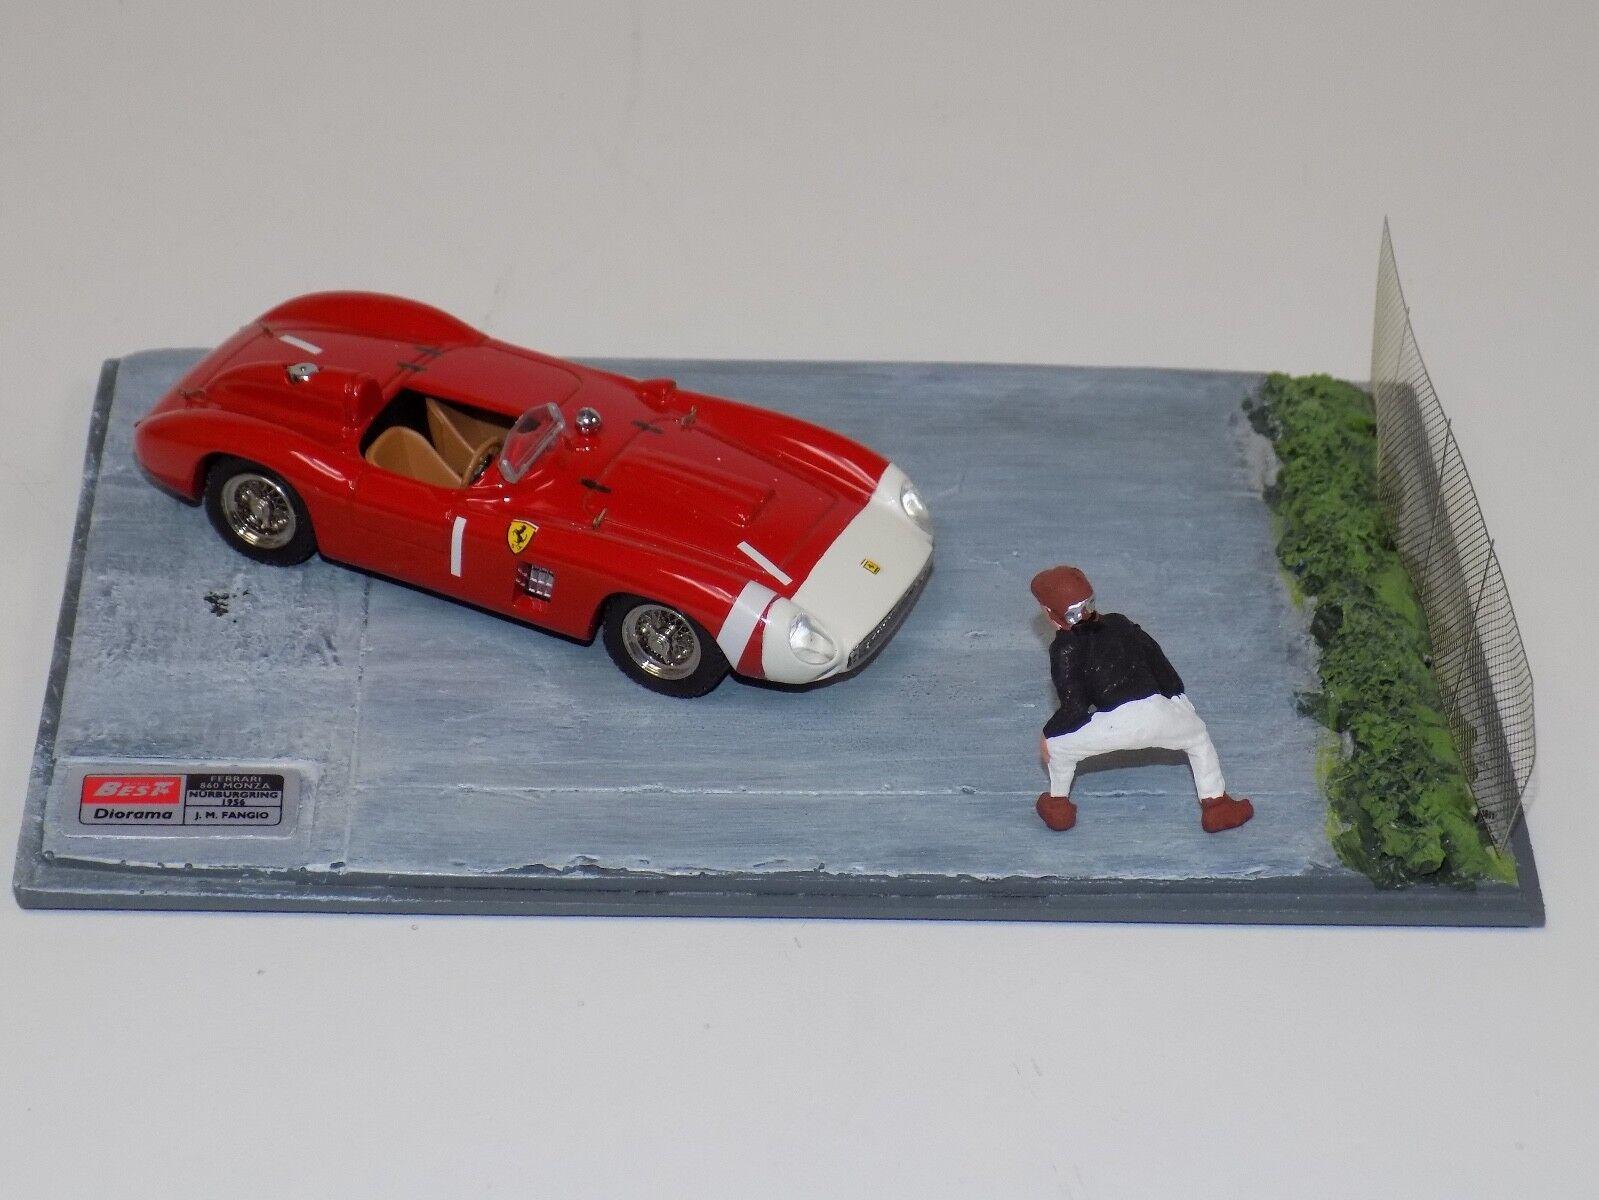 1 43 Best Model Ferrari 860 Monza voiture  1 1965 Nurburgring diorama Fangio  9607